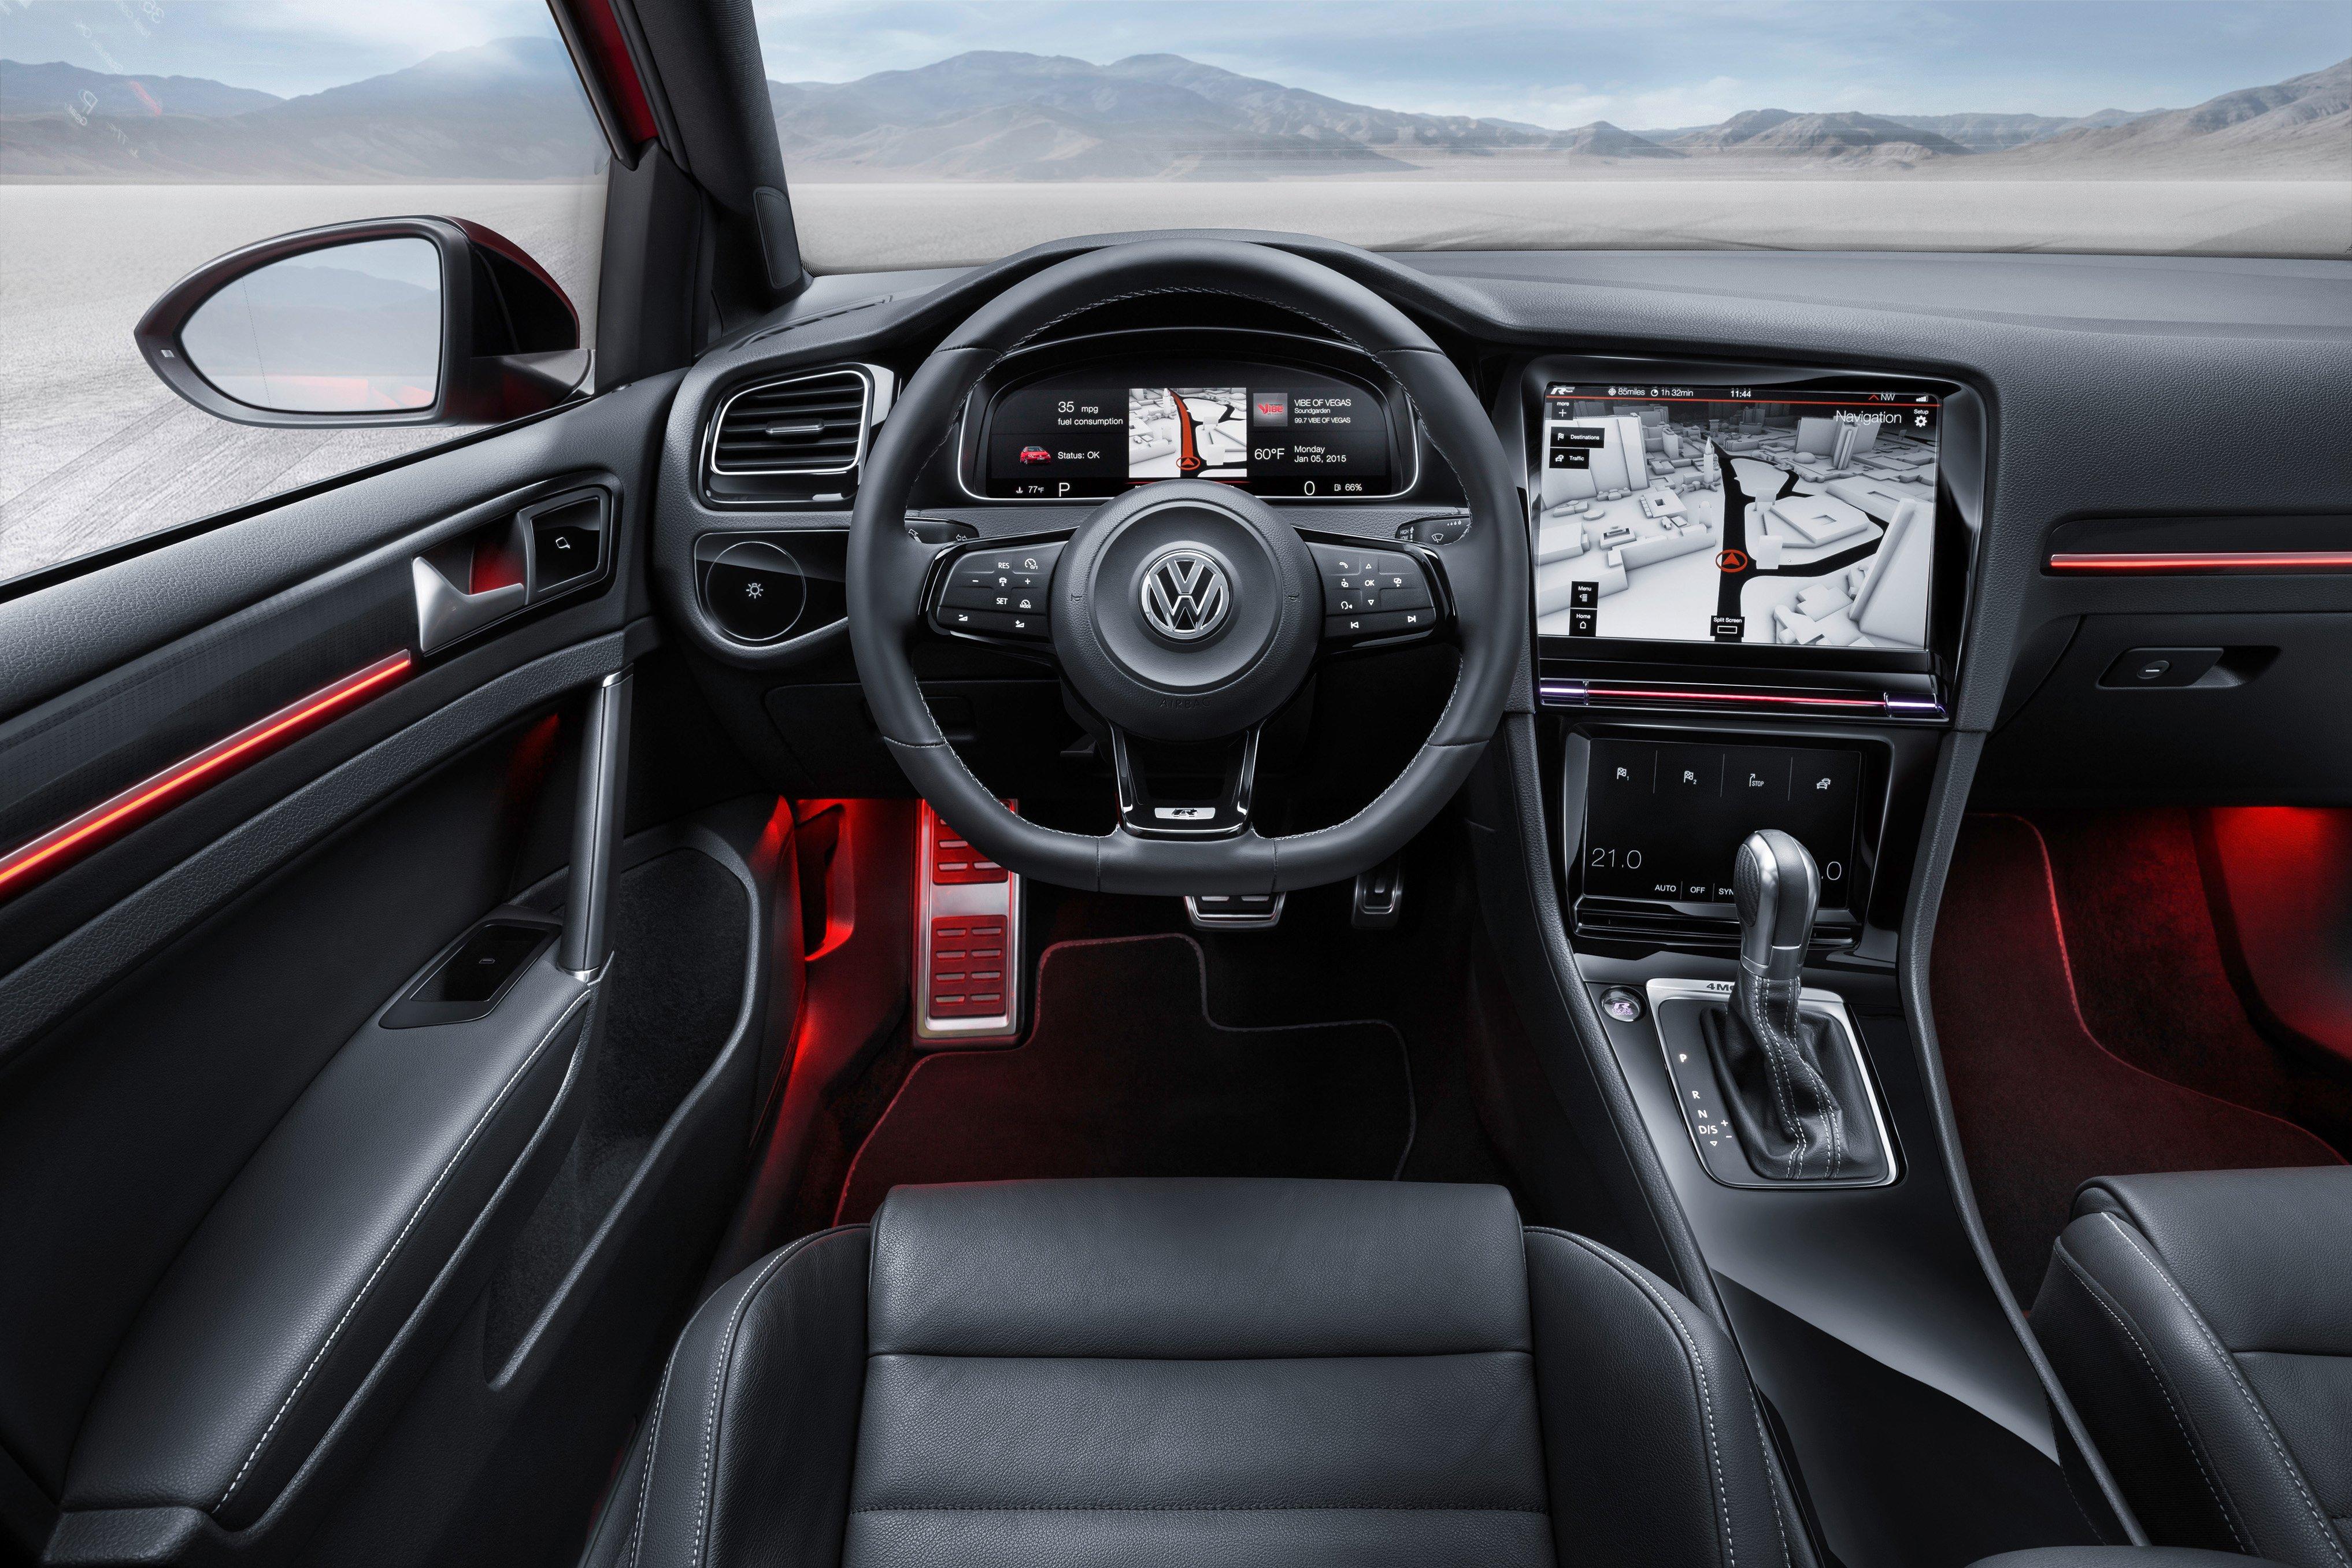 2016 VW Golf Mk7 facelift to feature gesture control   {Auto cockpit vw 8}